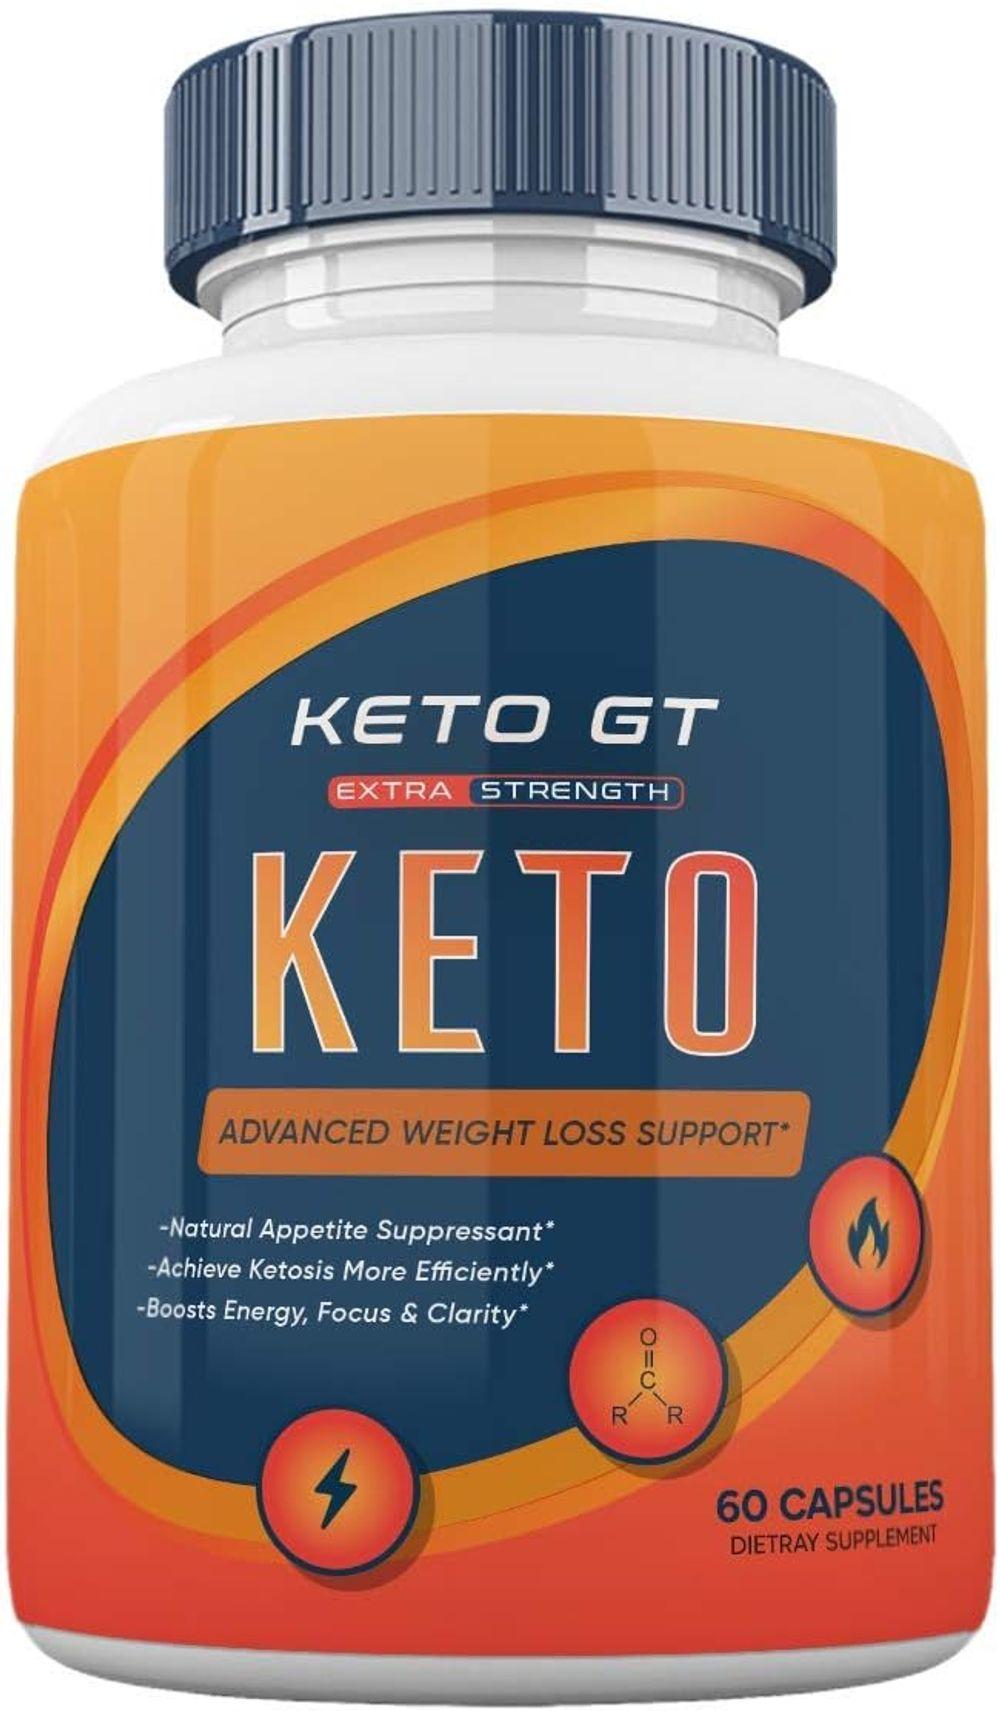 (Official) Keto GT Advanced Weight Loss Formula, Keto GT Pills, Keto BHB - 60 Capsules